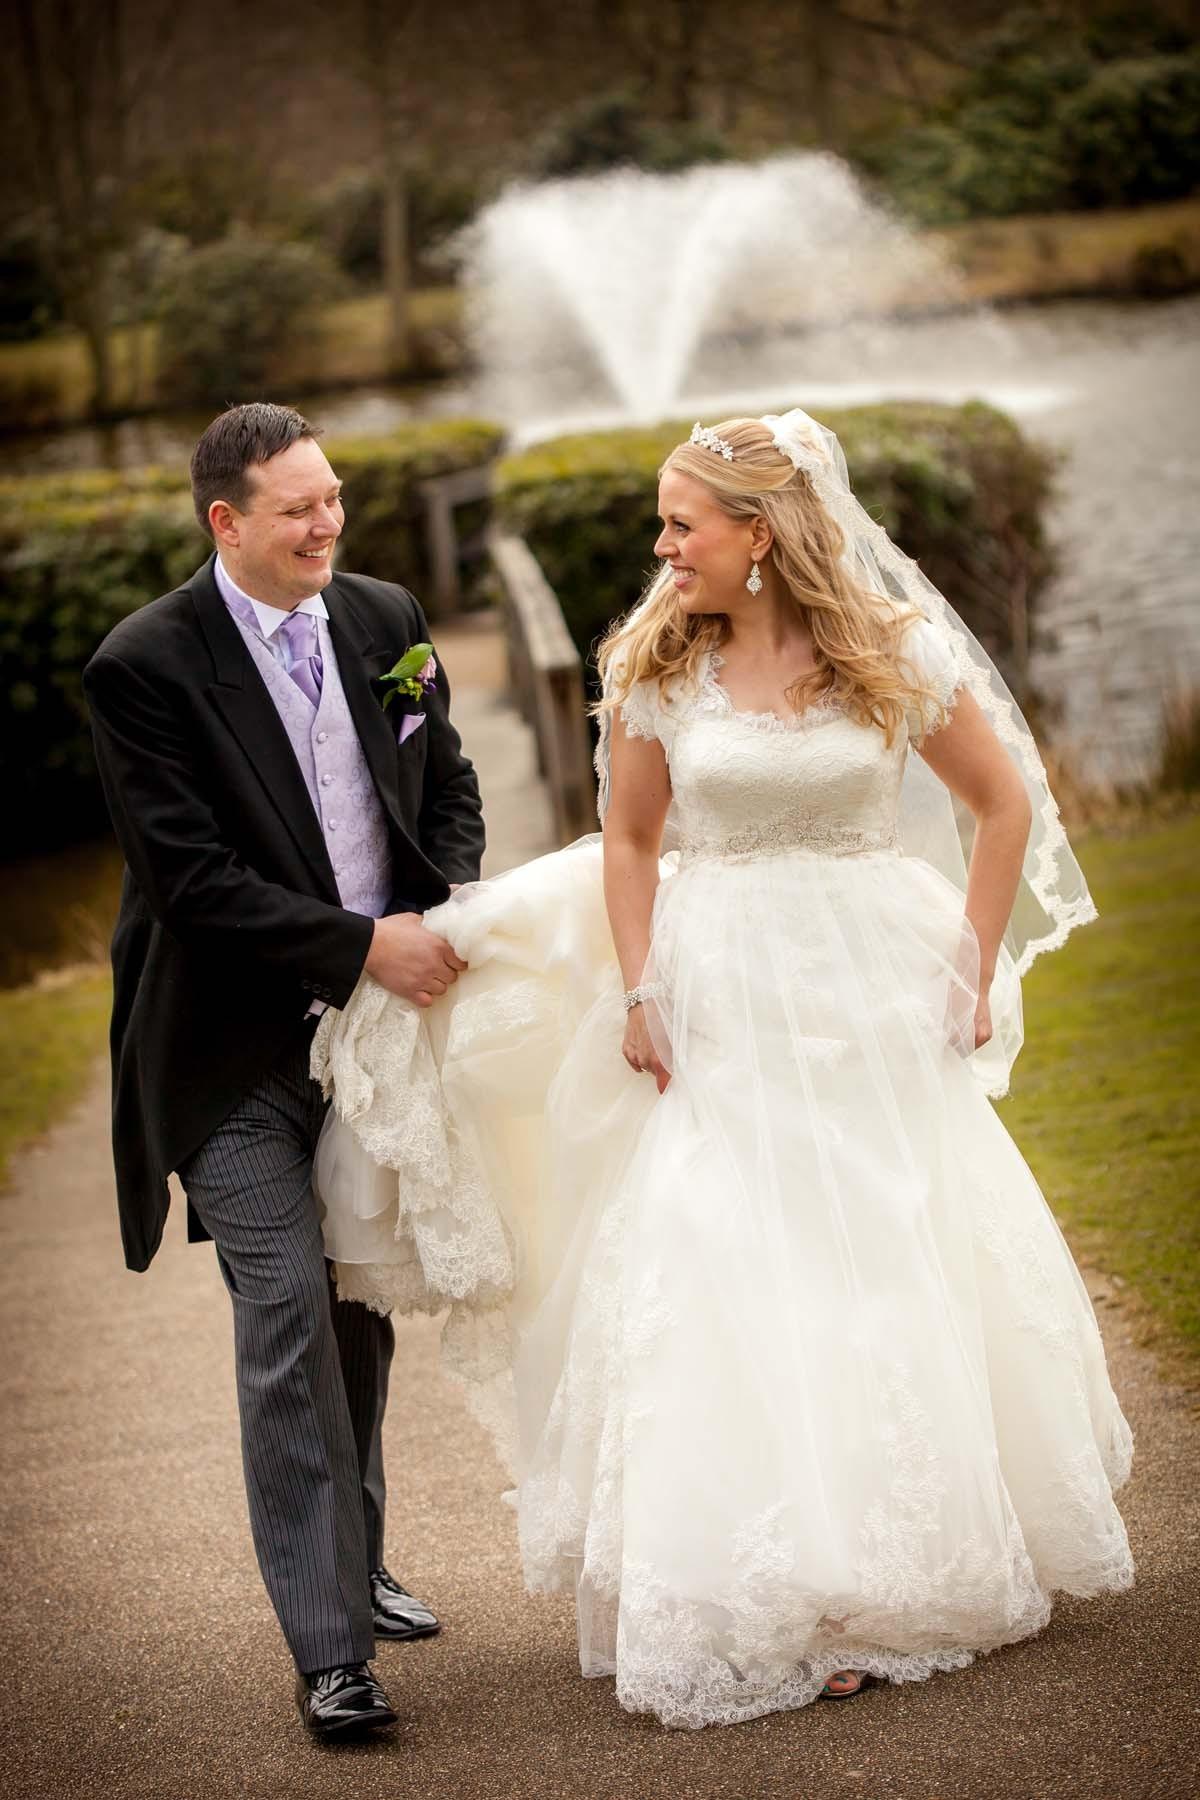 Sussex & Surrey Wedding Photographer - Bride & Groom (25)